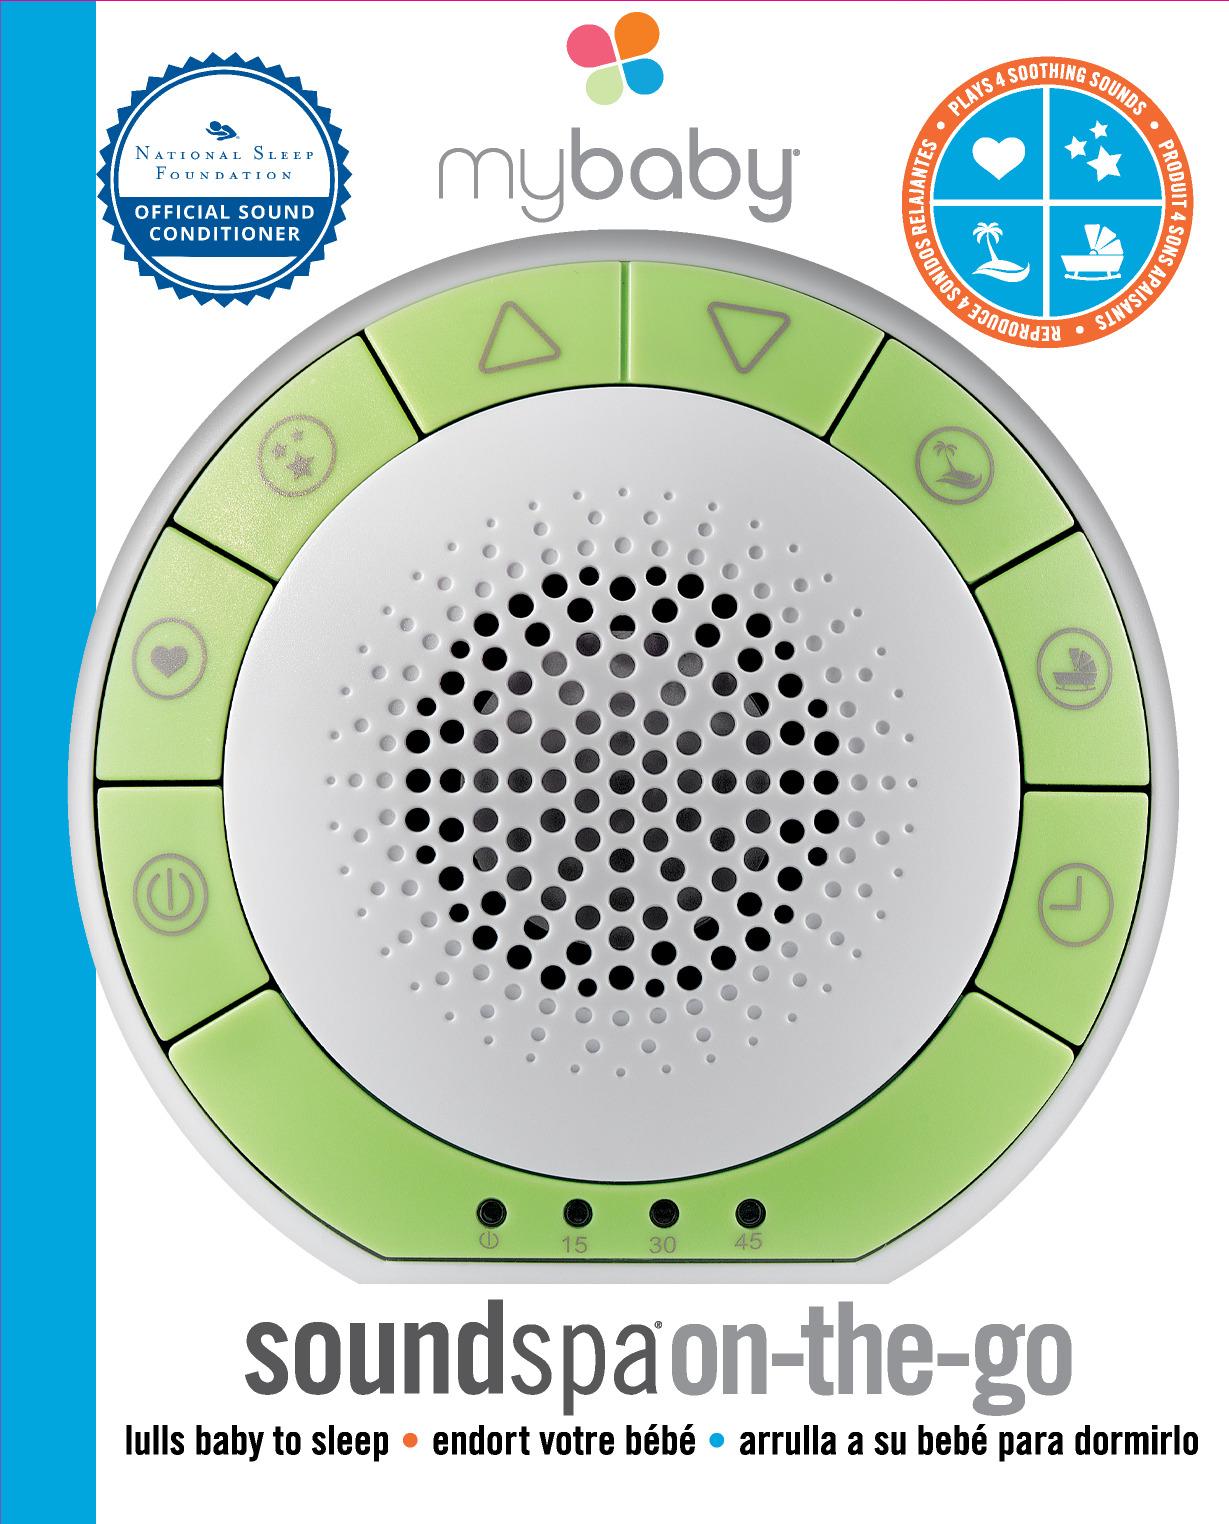 MyBaby: Sound Spa - On The Go image